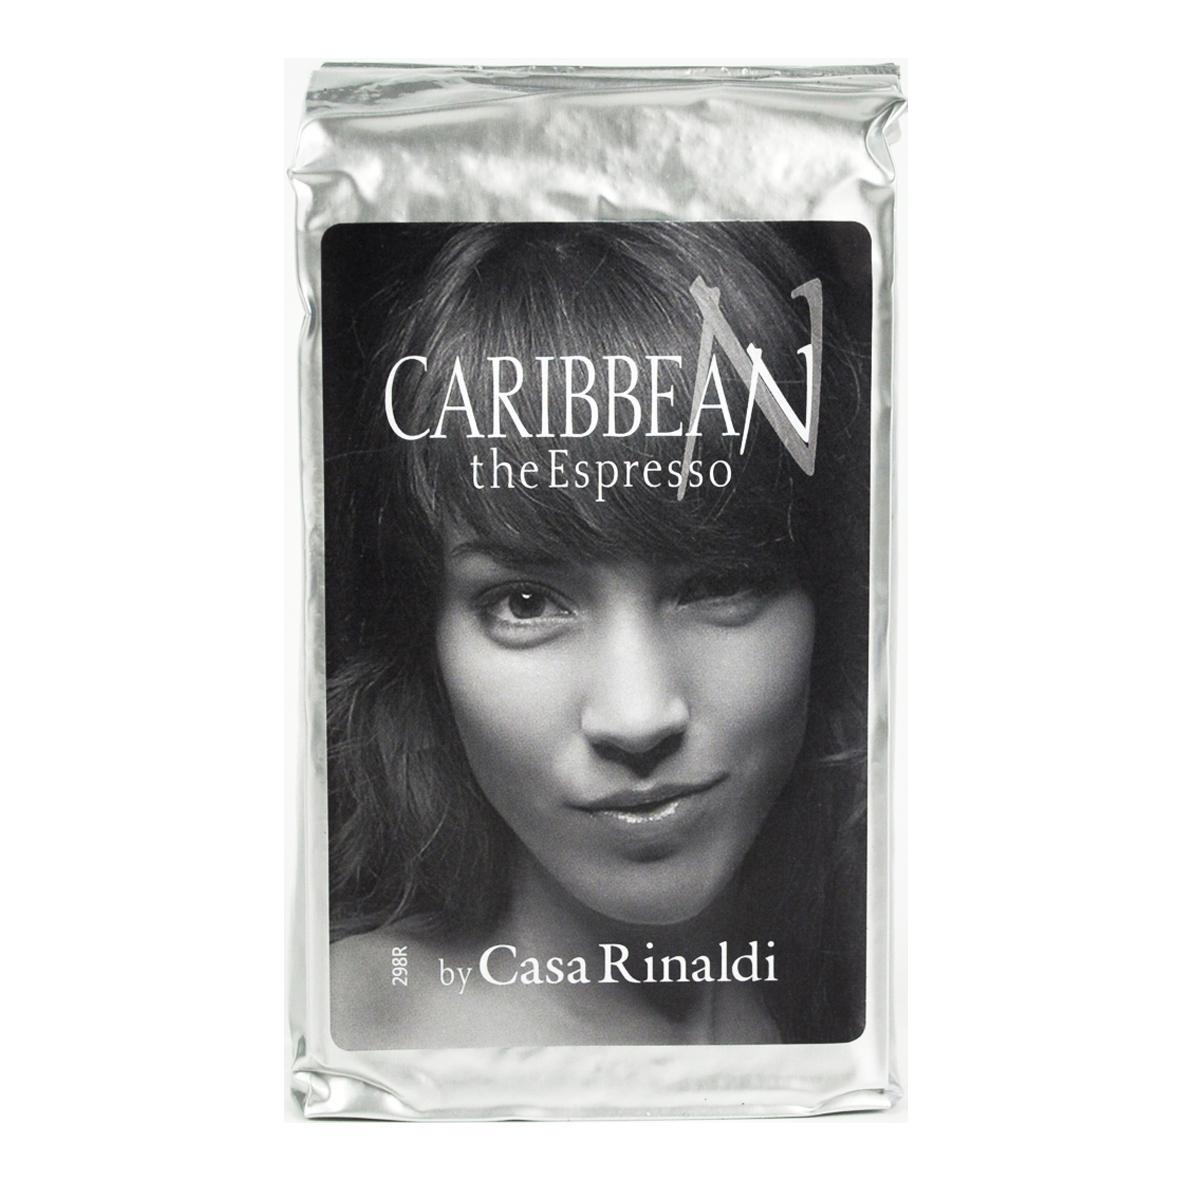 Кофе Casa Rinaldi натуральный жареный эспрессо Карибский молотый 250 гр